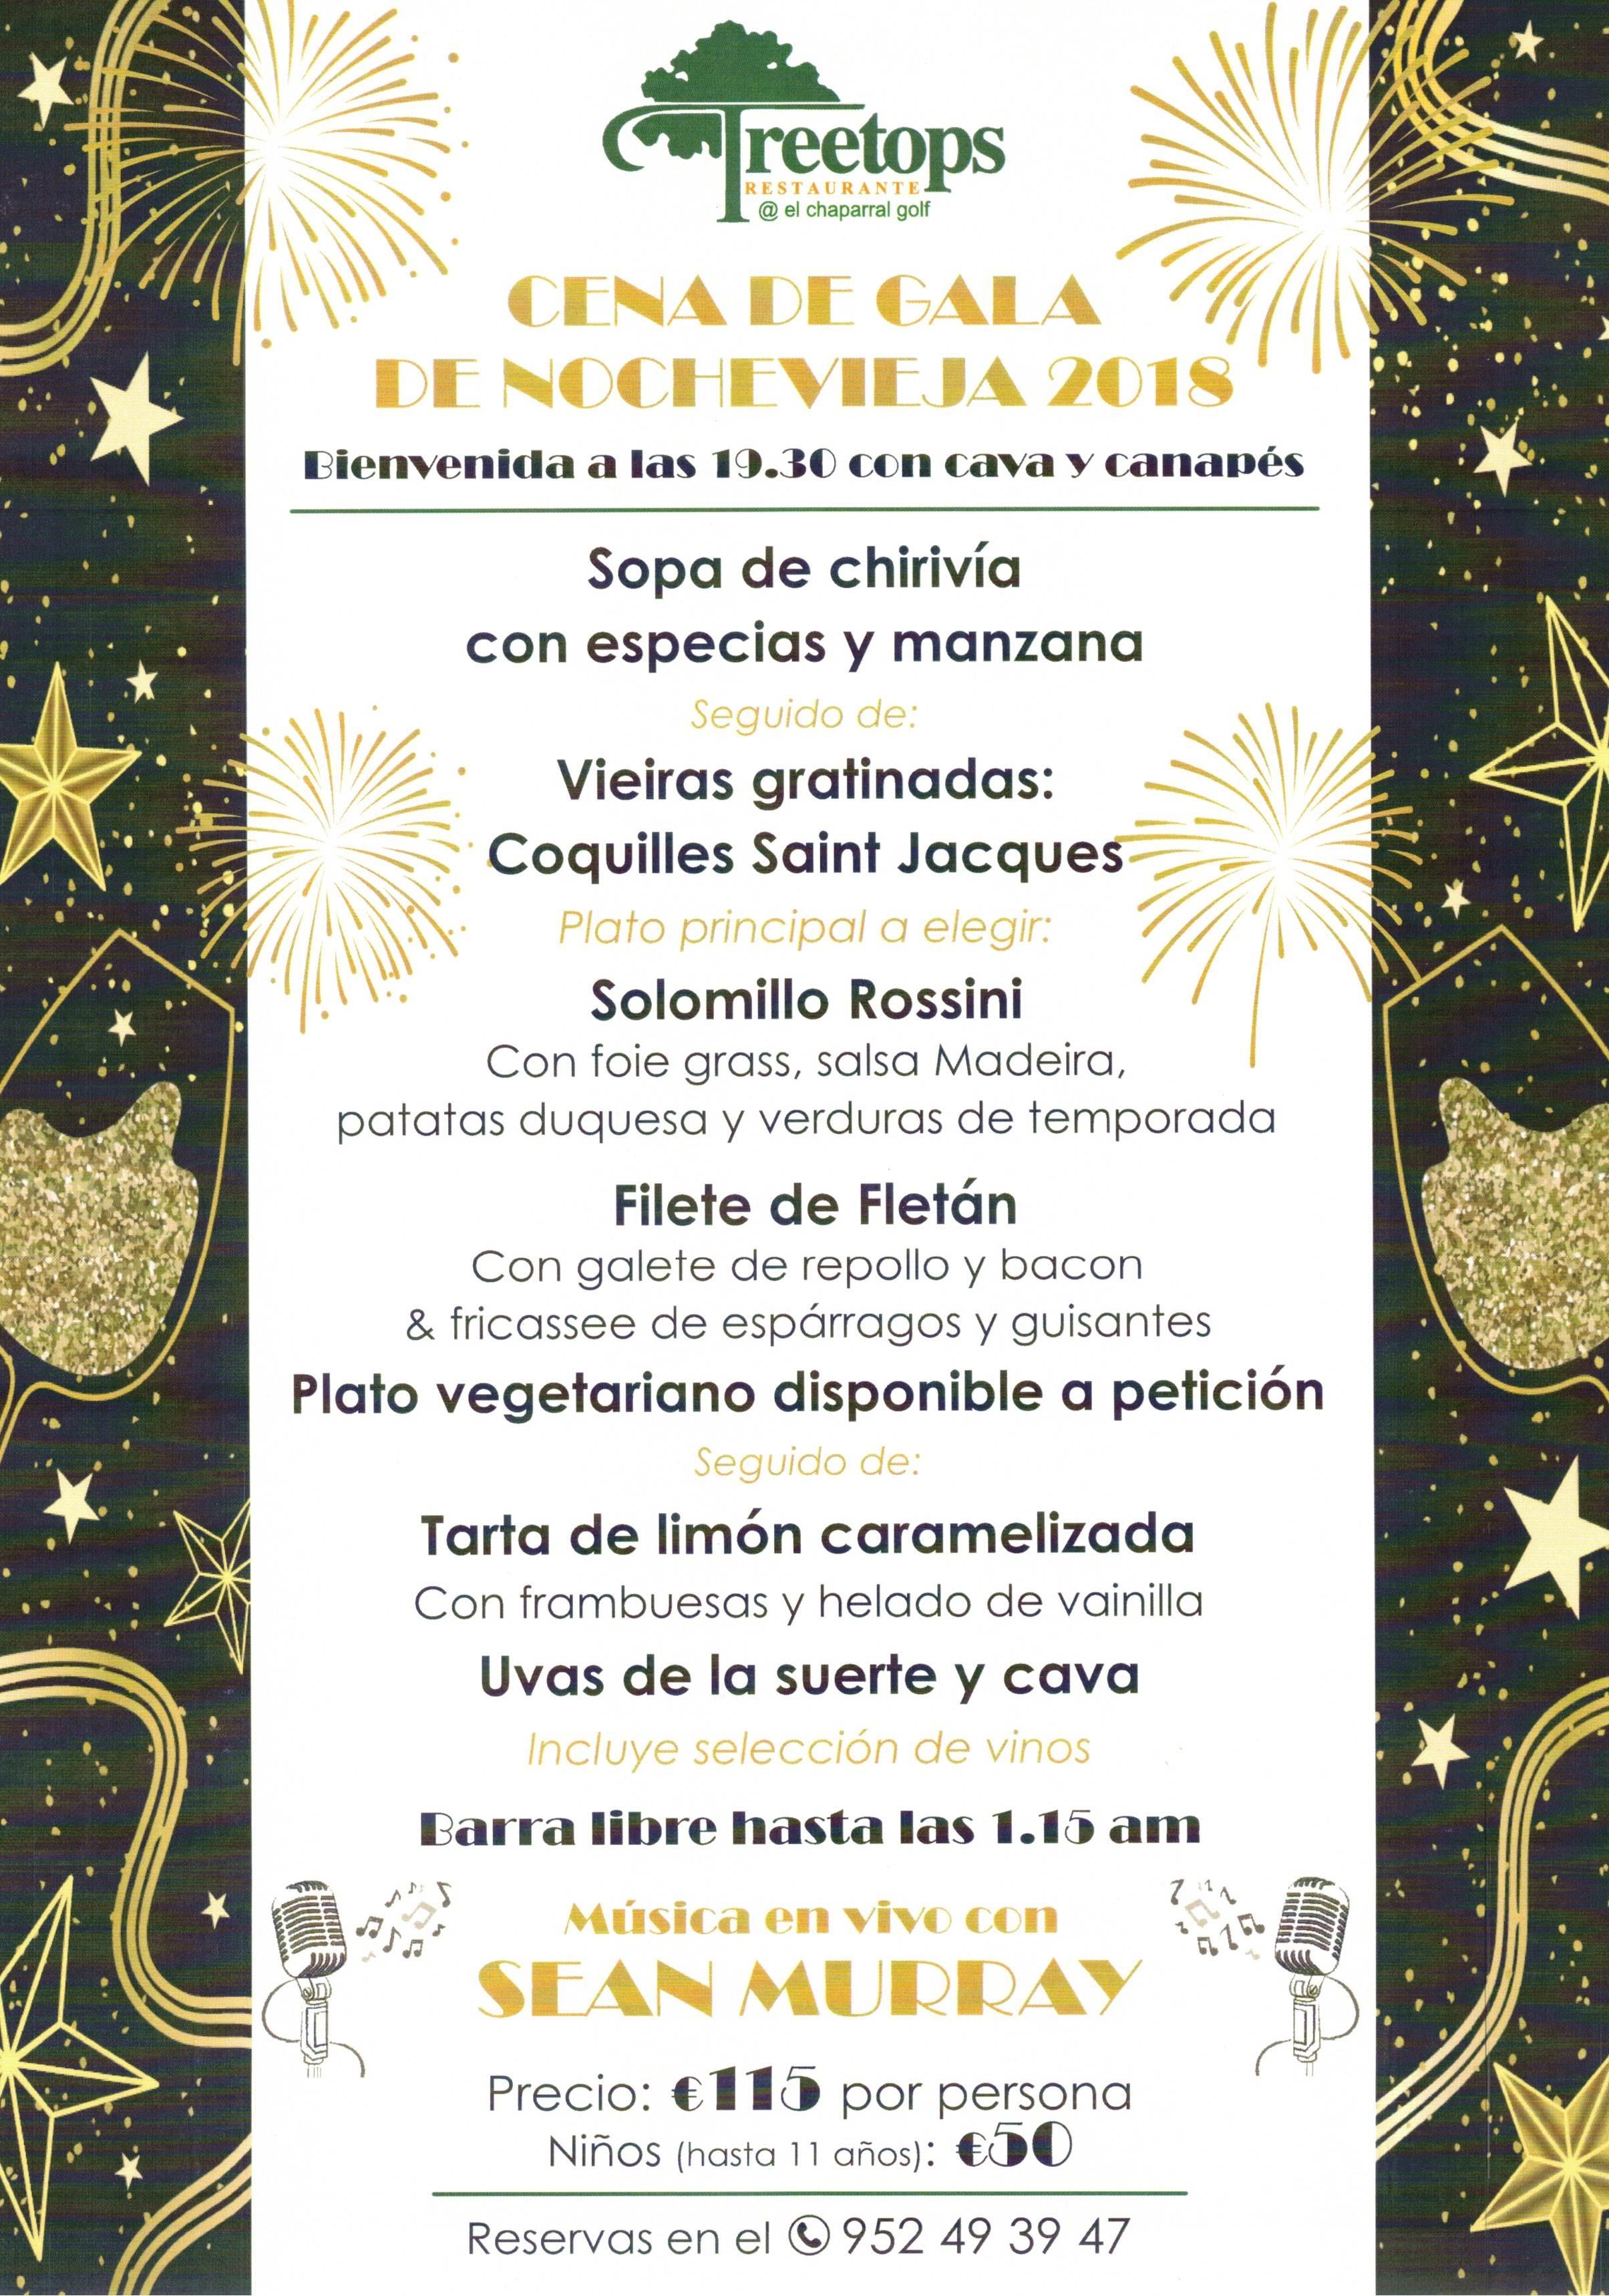 CENA DE NOCHEVIEJA 2018 CHAPARRAL GOLF CLUB, MIJAS, COSTA DEL SOL